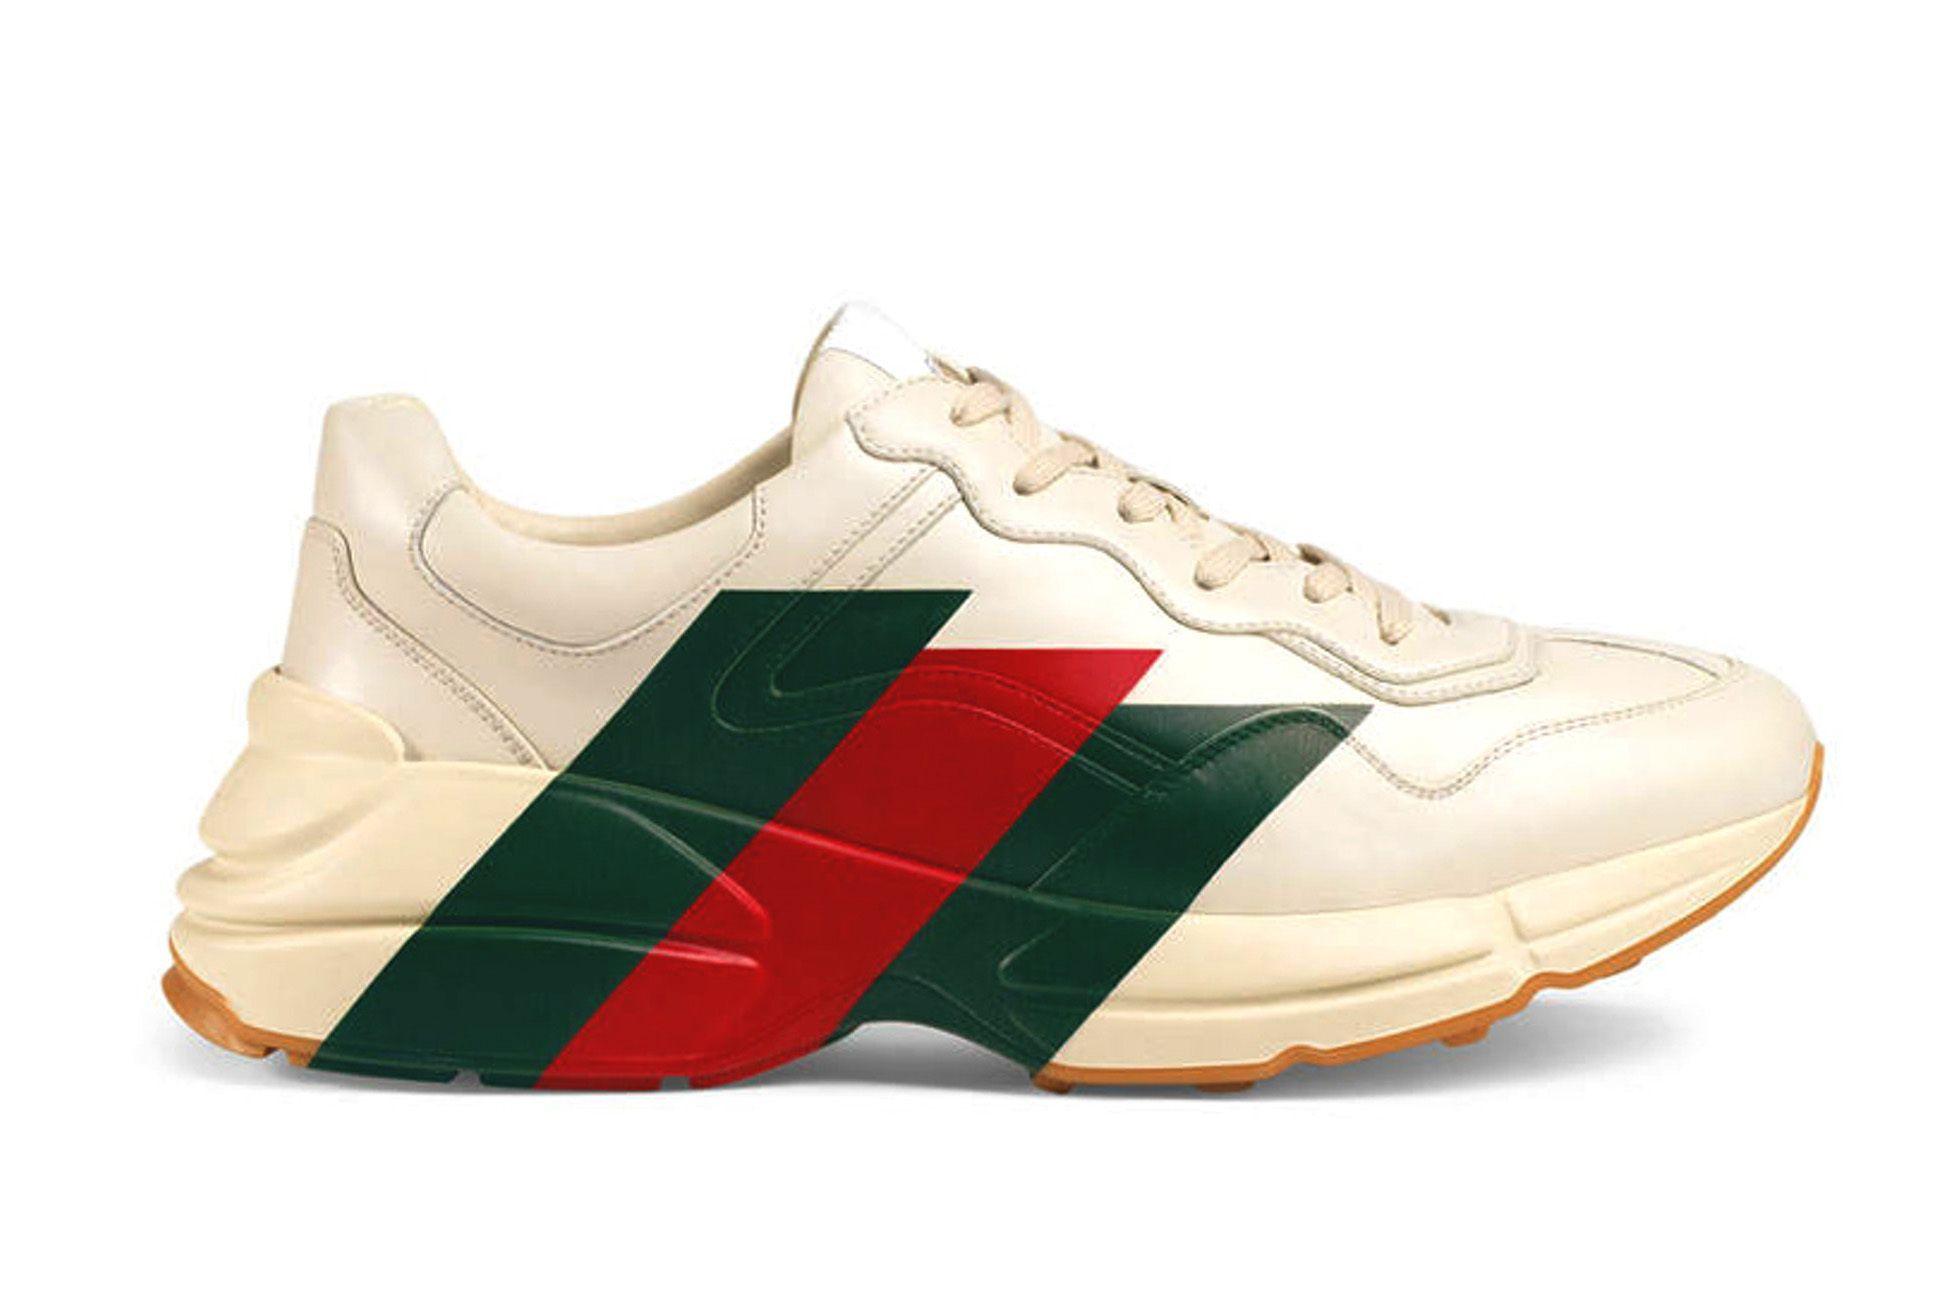 Gucci Rhyton Web Print Sneakers Black White Release 02 Sneaker Freaker